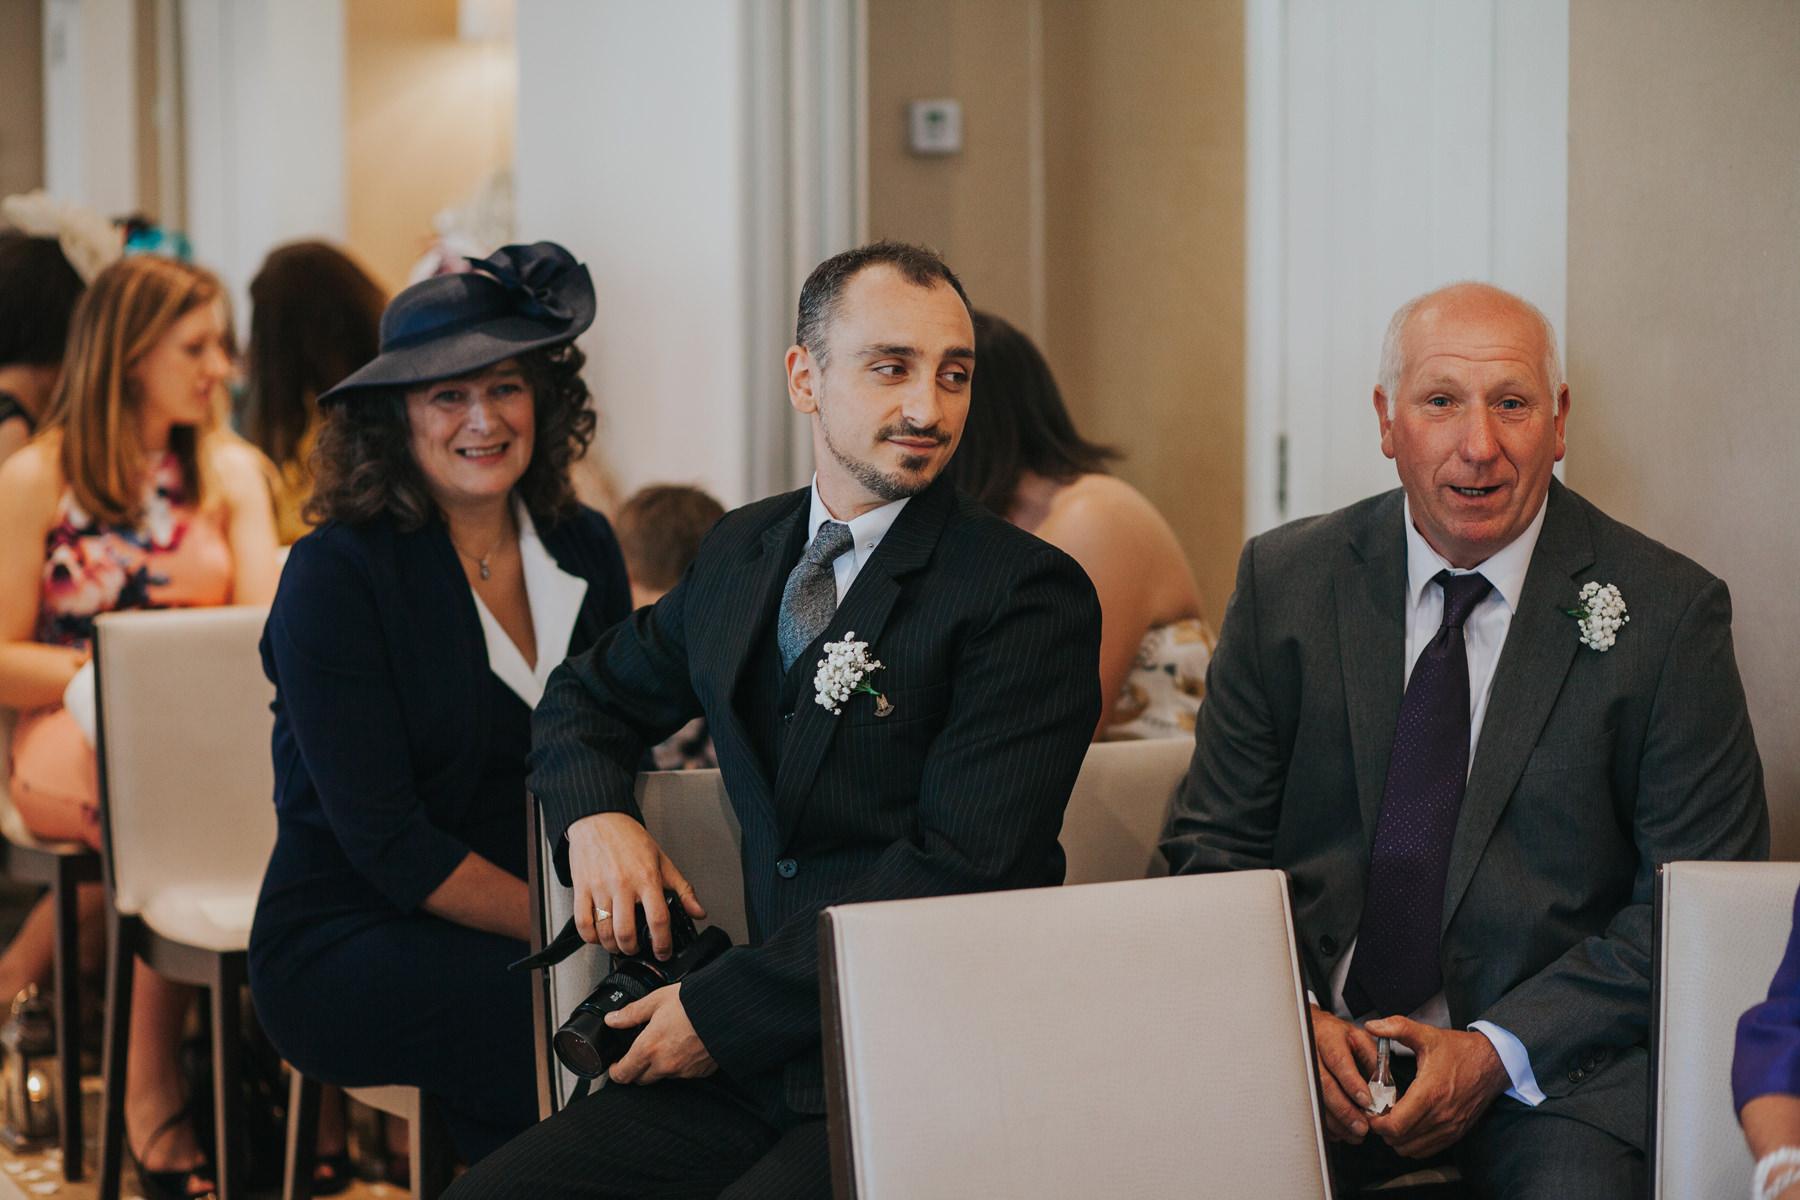 The Bingham Wedding Photographer London--groom waiting with guests ceremony room-CRL-99.jpg